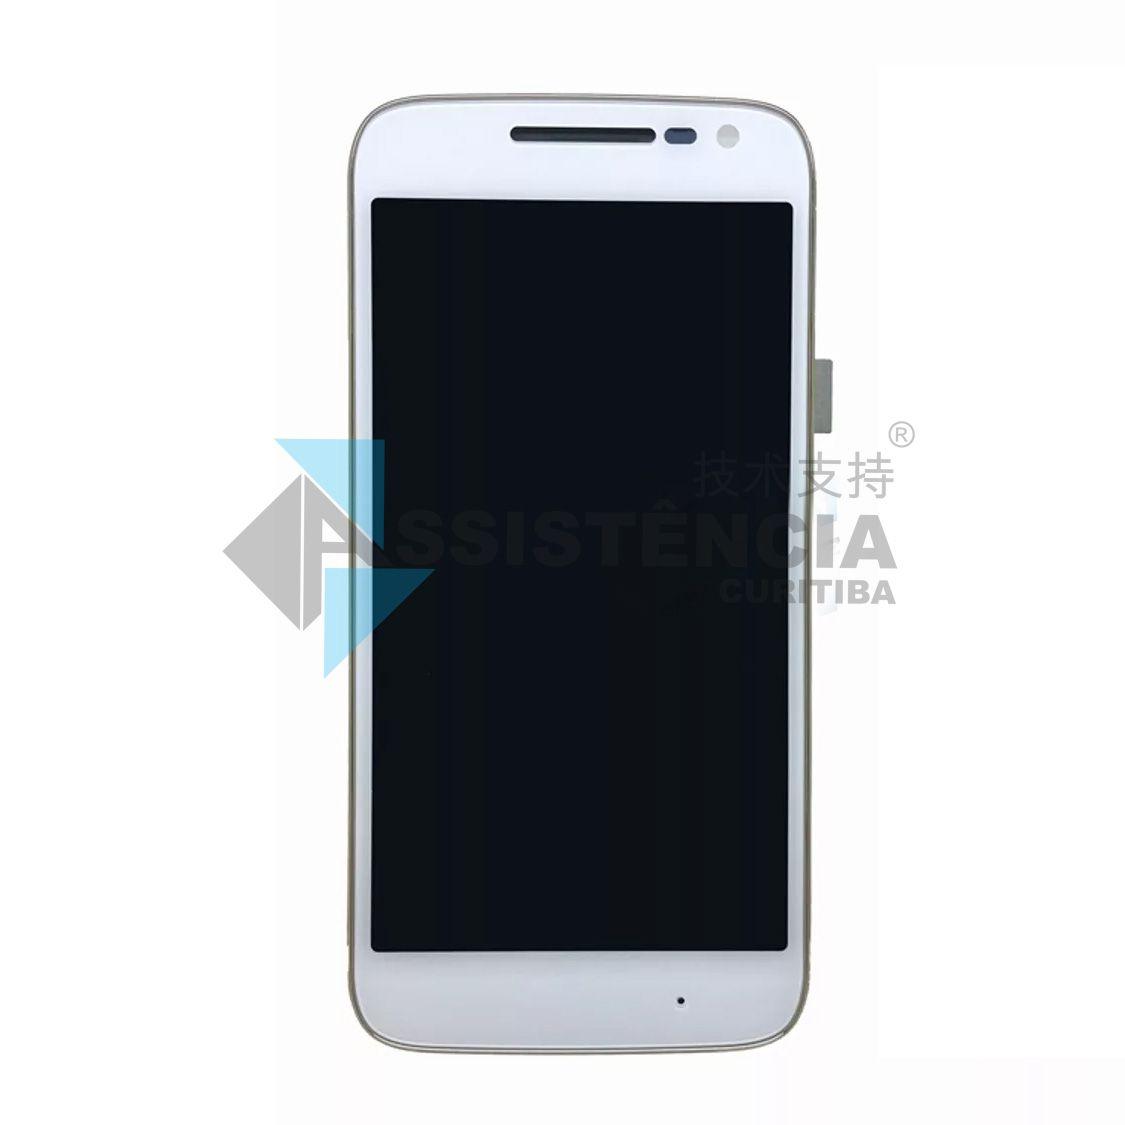 Tela Display Motorola Moto G4 Play Xt1600 Xt1603 Com Aro Branco